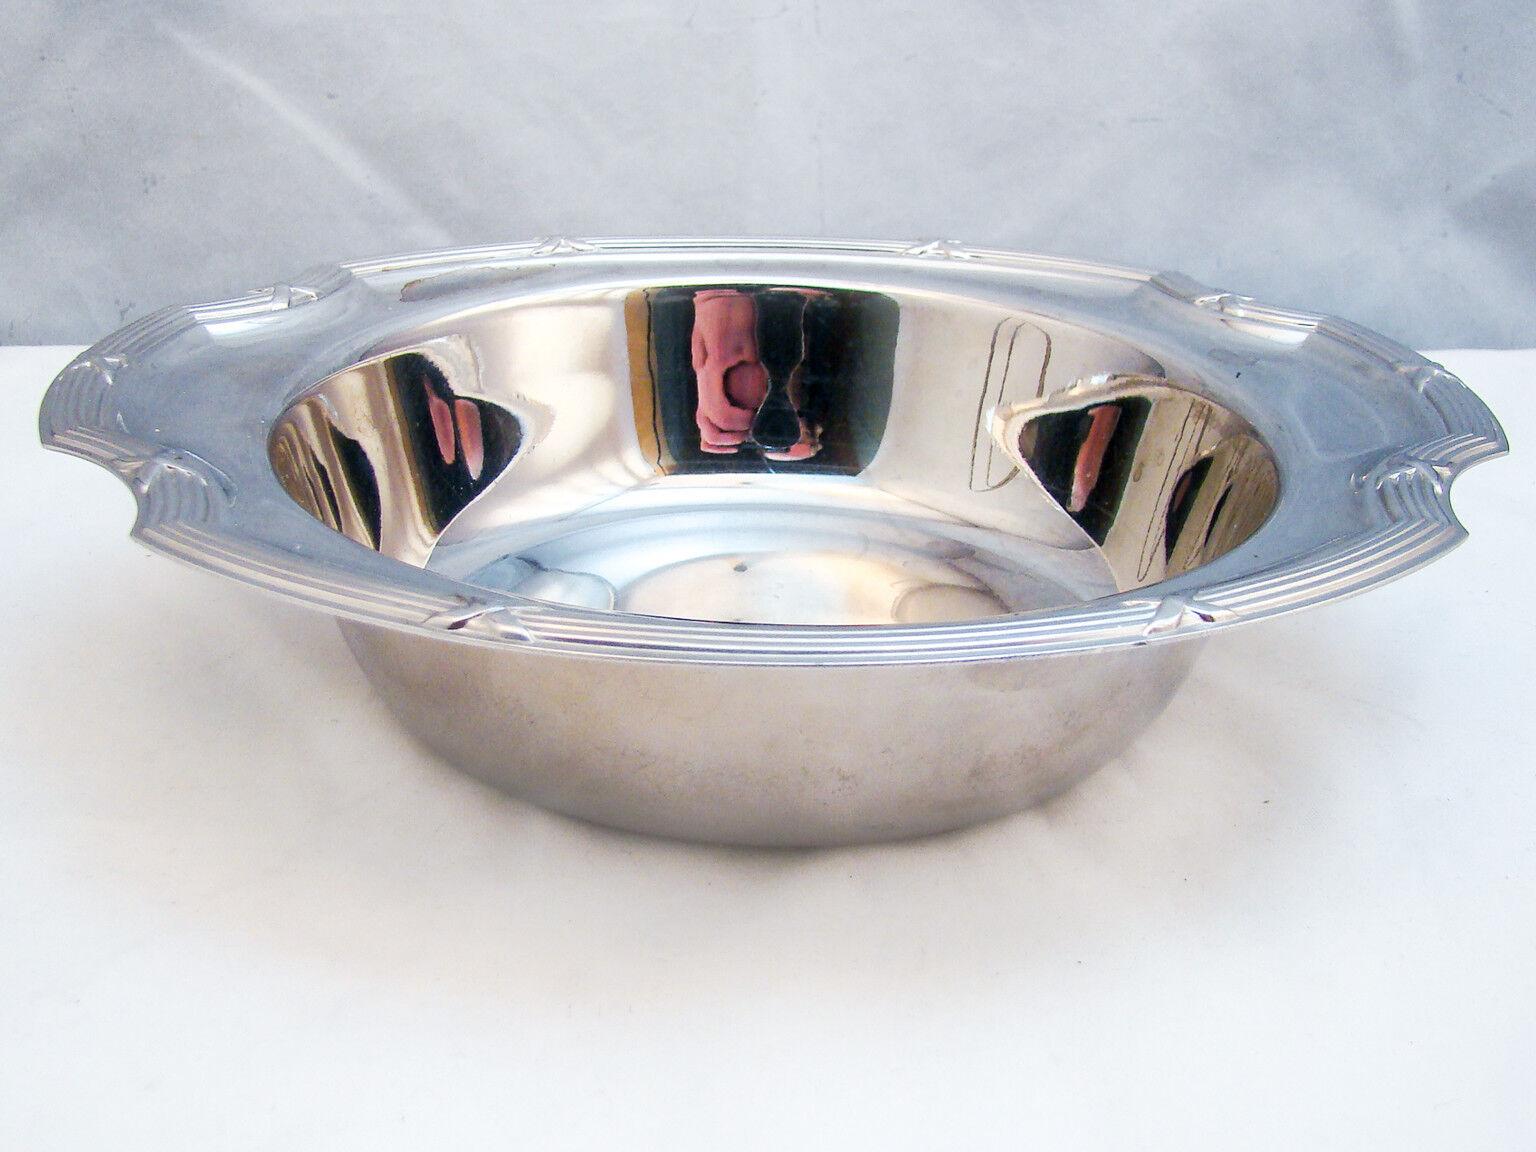 WMF Cromargan Stainless Steel GRAND RIBBON Deep Bowl Candy Dish